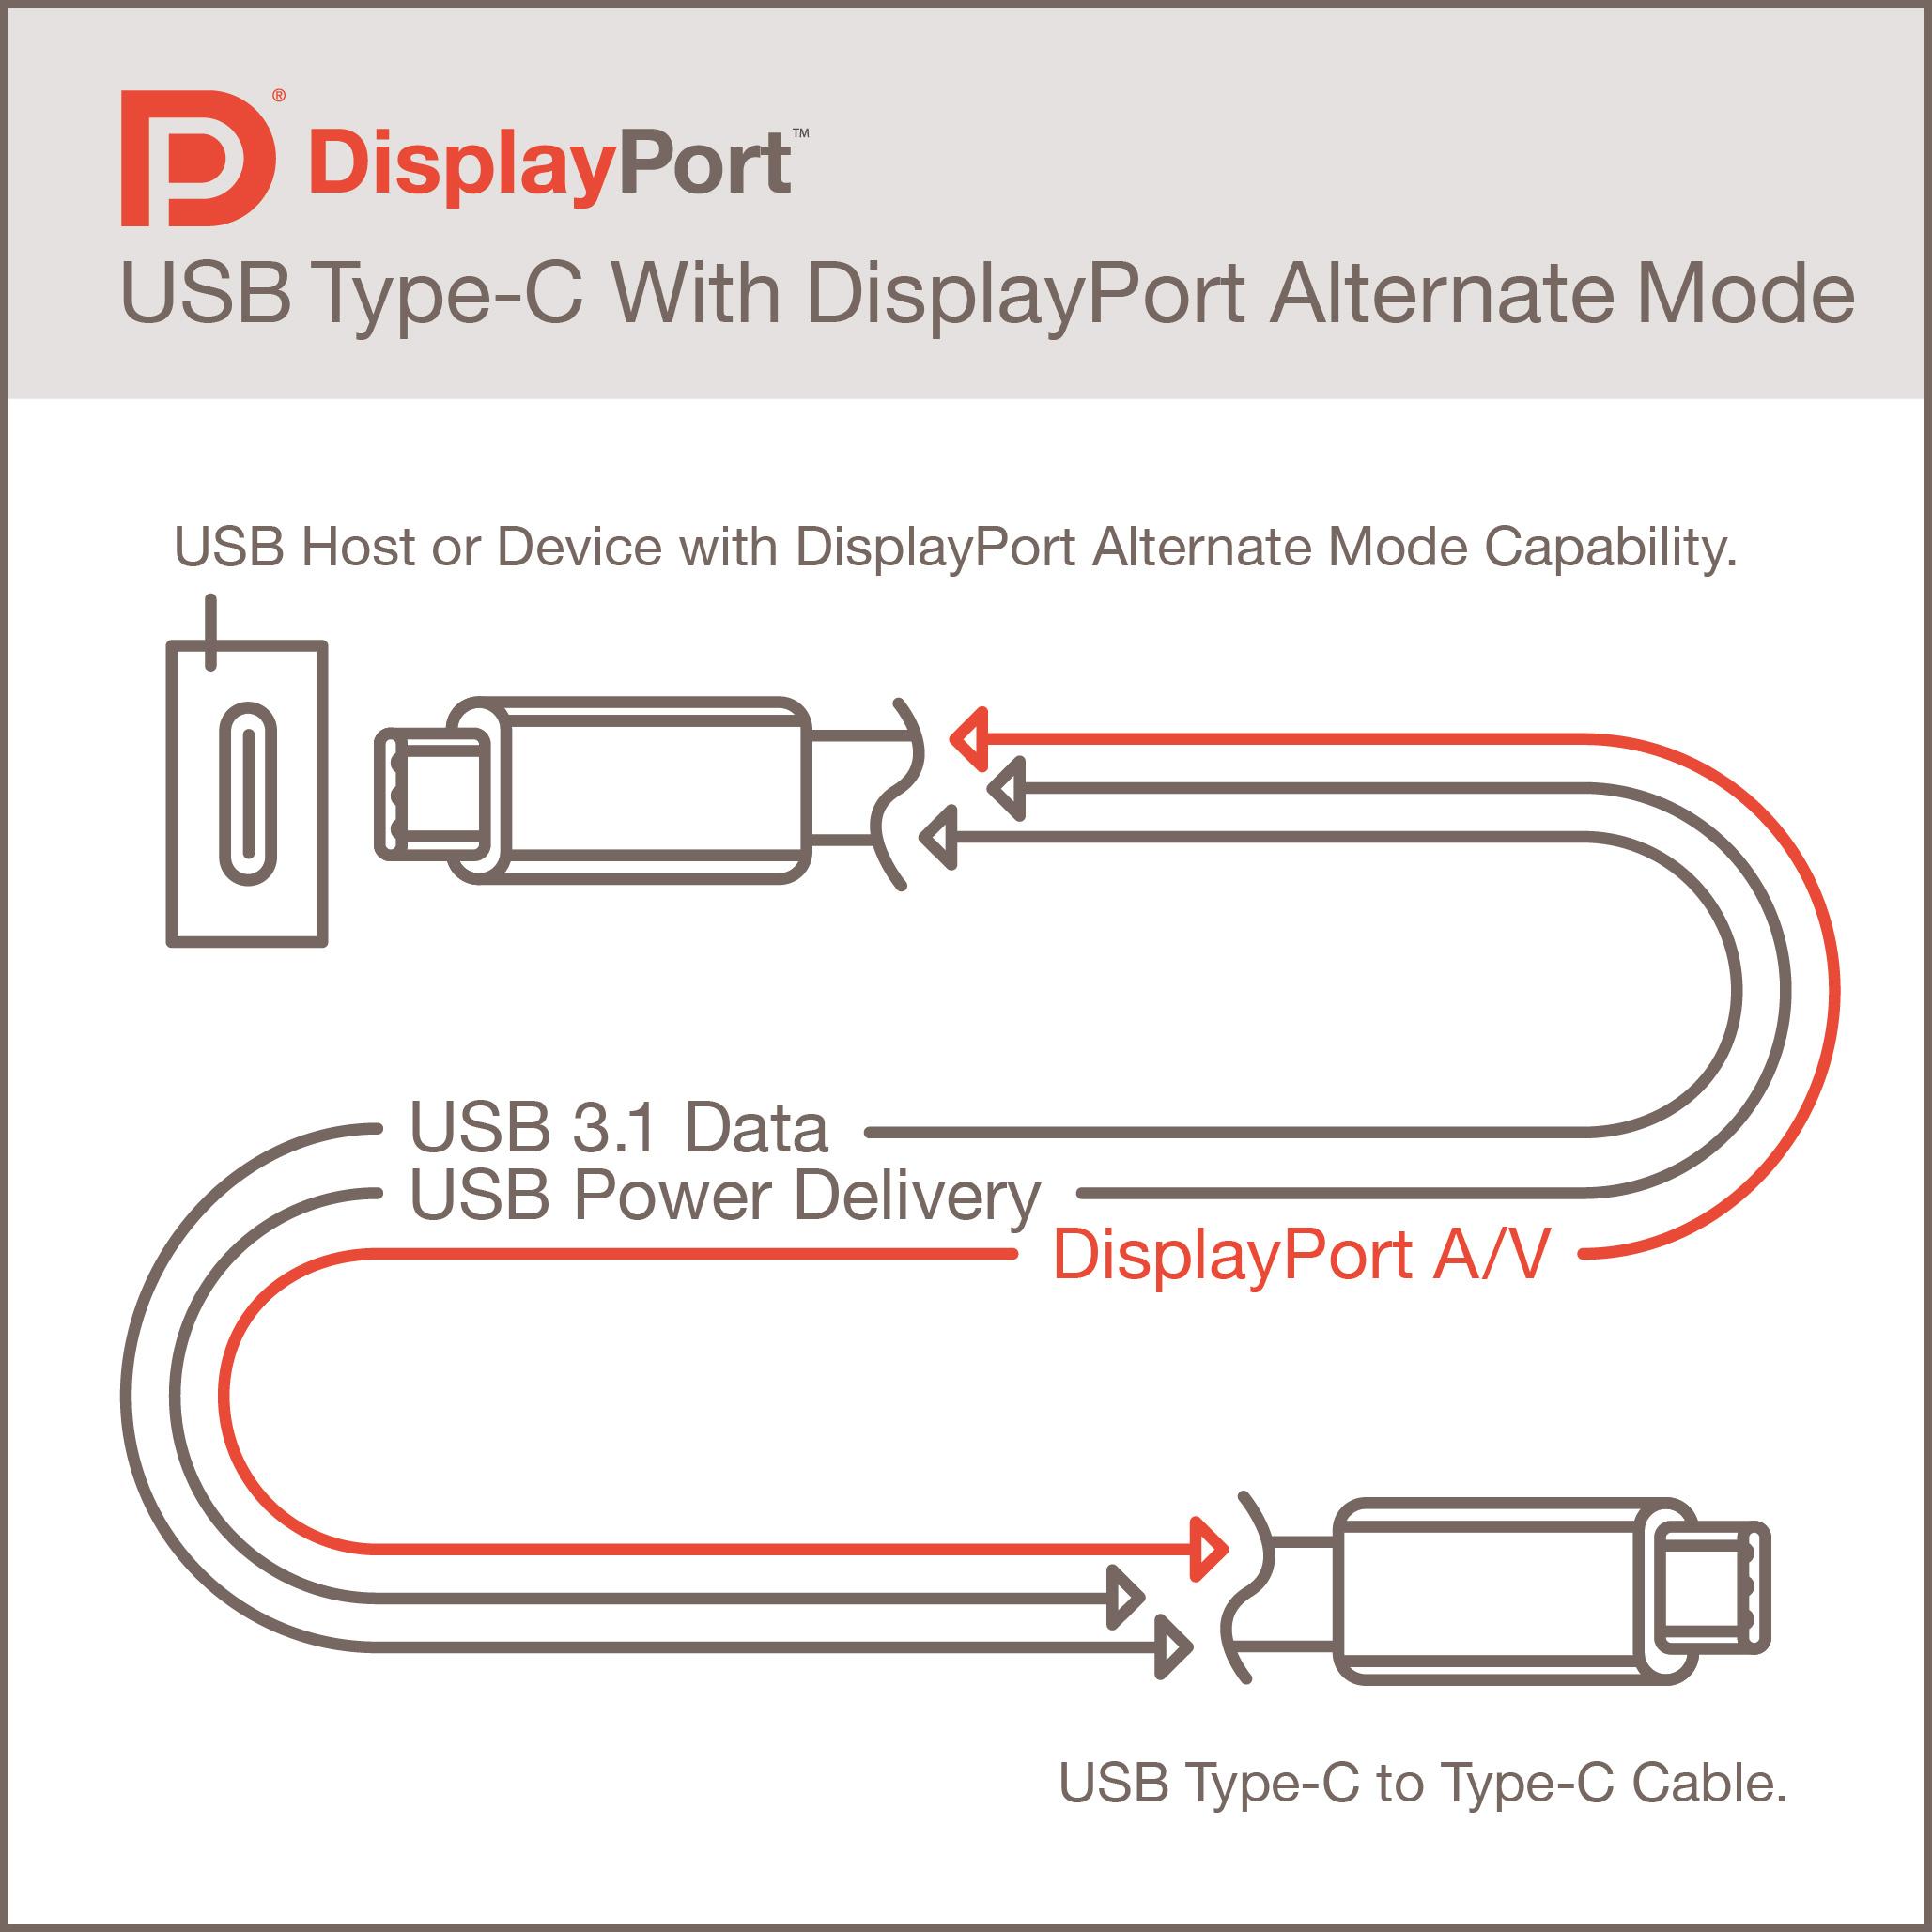 Wiring Diagram For Displayport | Wiring Library - Usb Type C Wiring Diagram